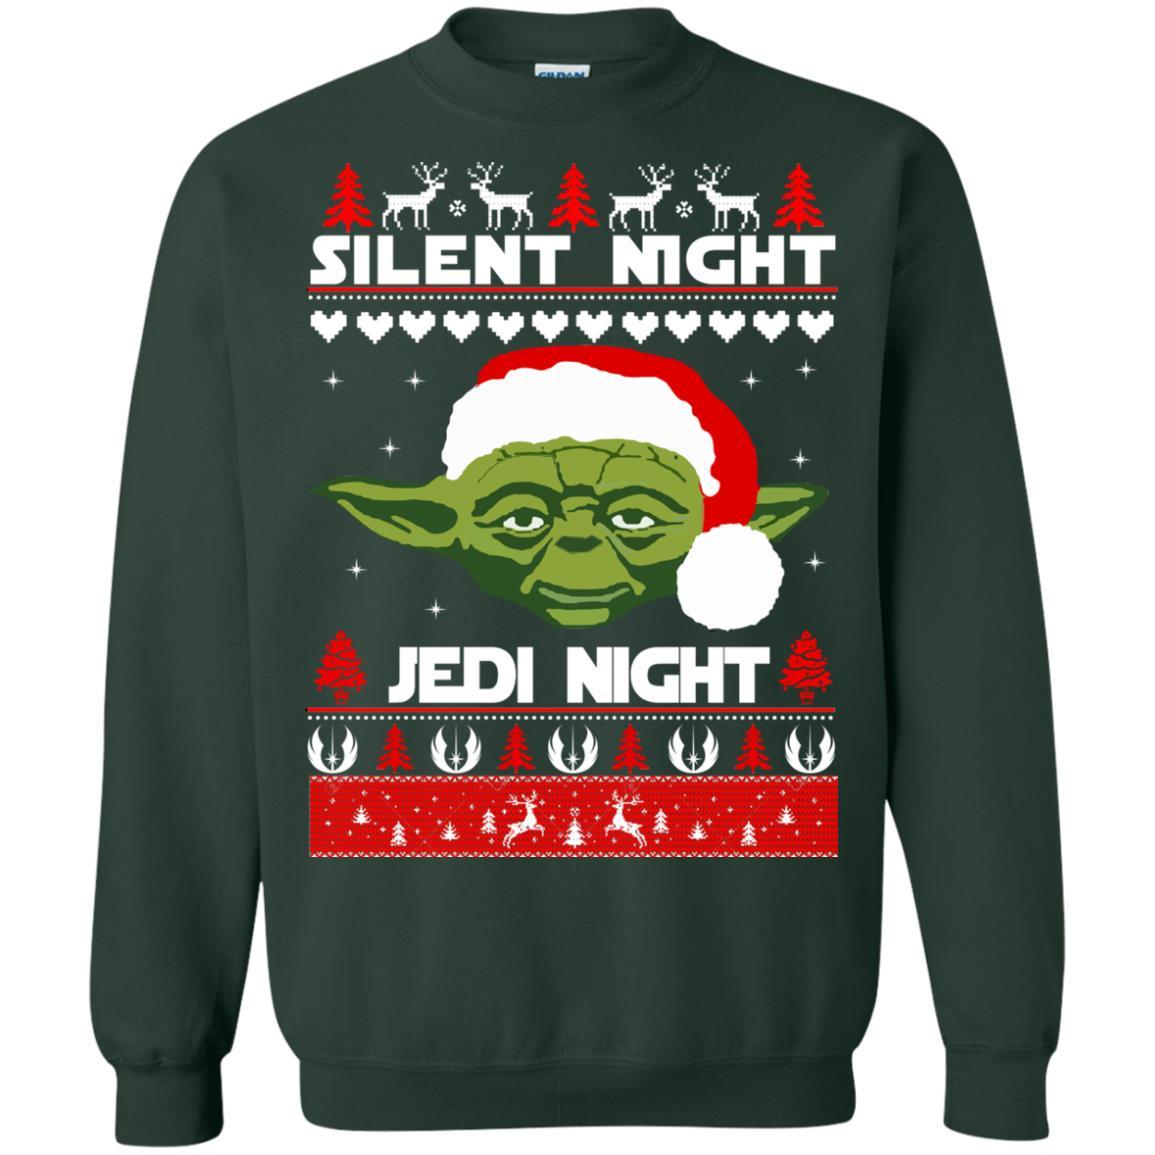 image 1719 - Yoda Star Wars: Silent Night Jedi Night Christmas Sweater, Hoodie